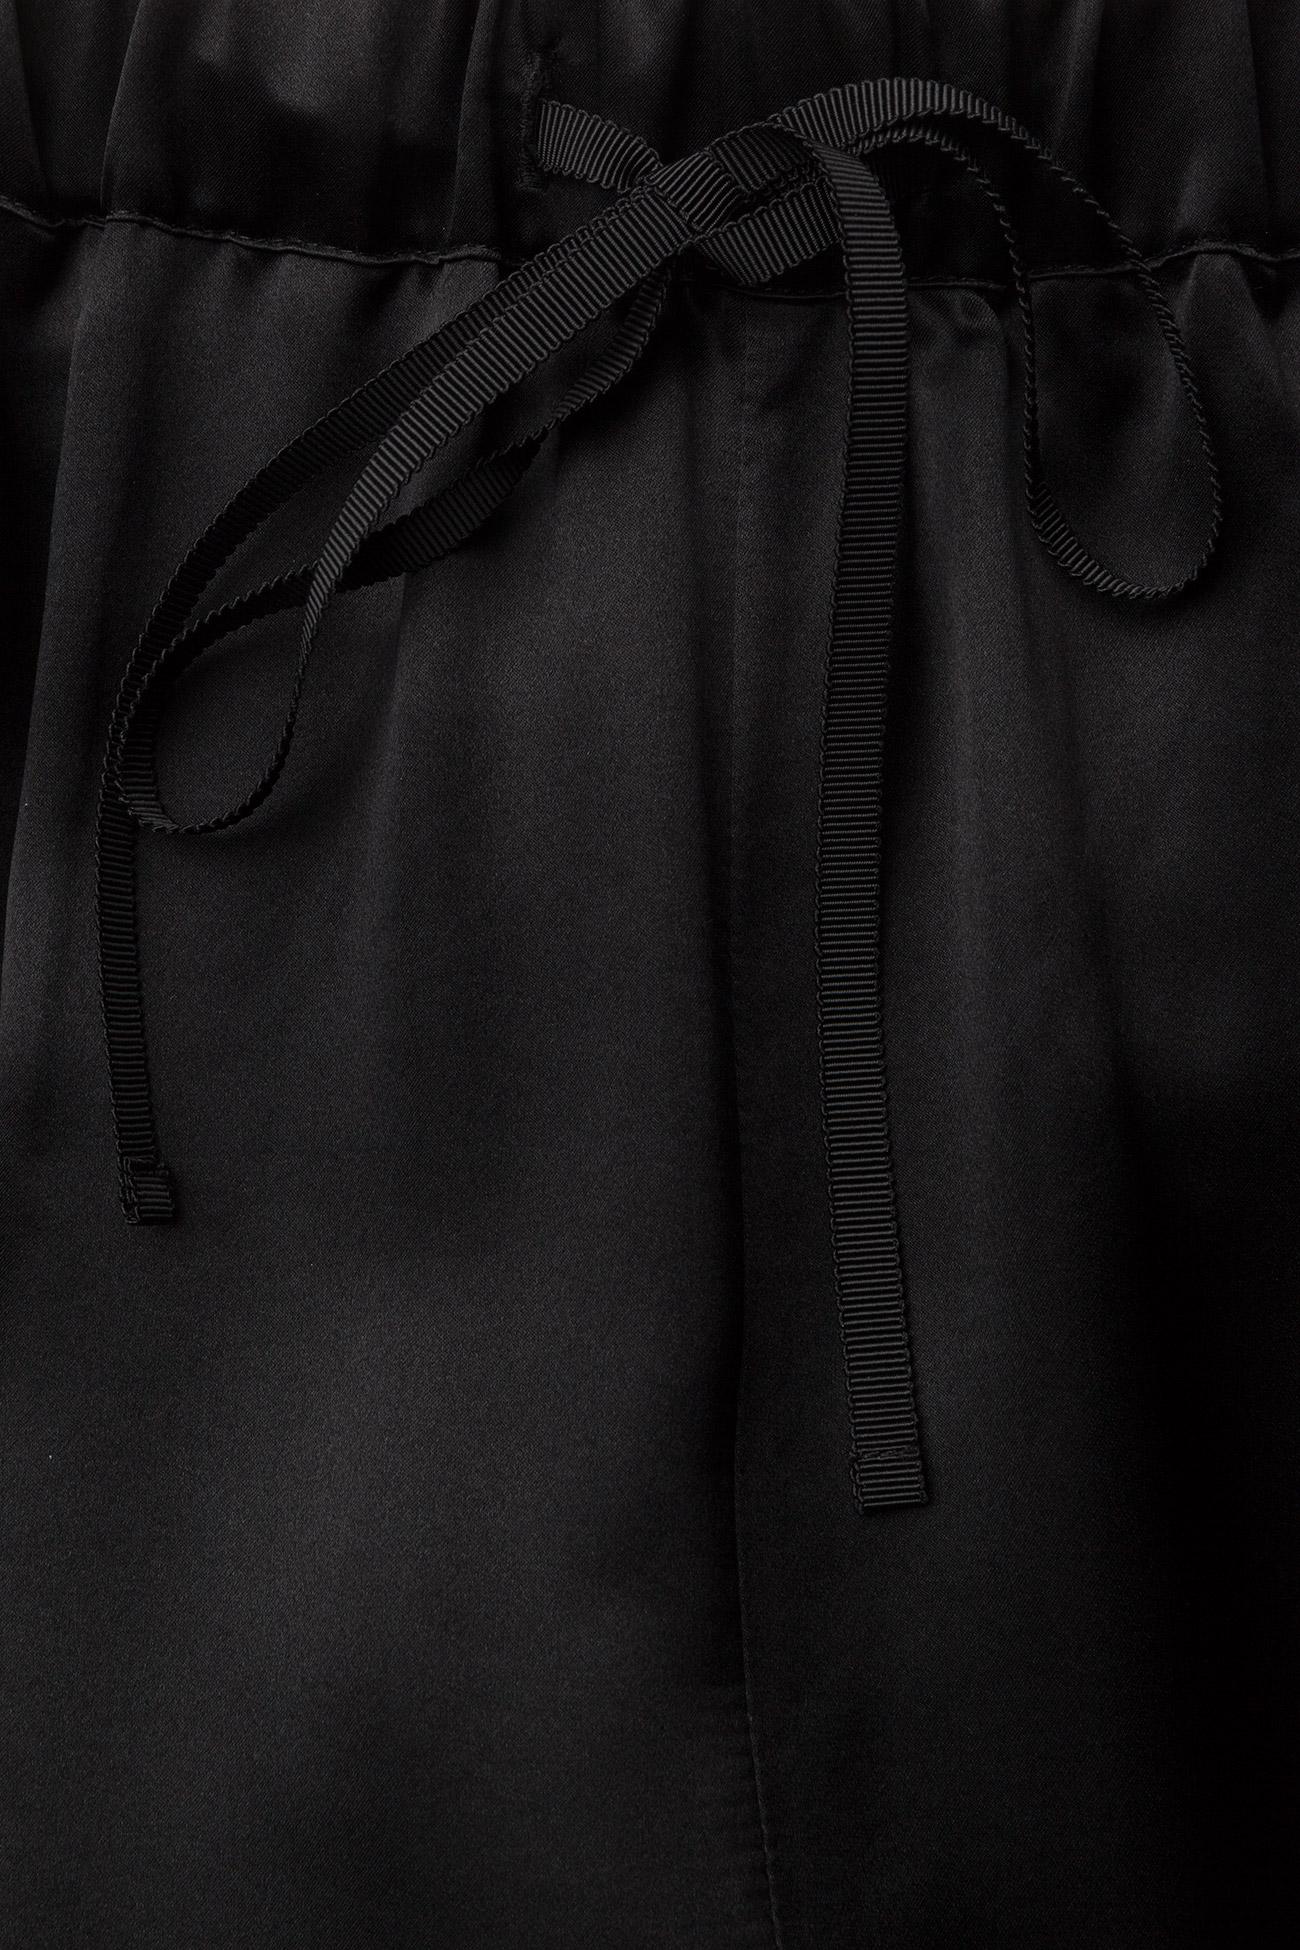 J. Lindeberg Spring Viscose Silk - Trousers BLACK